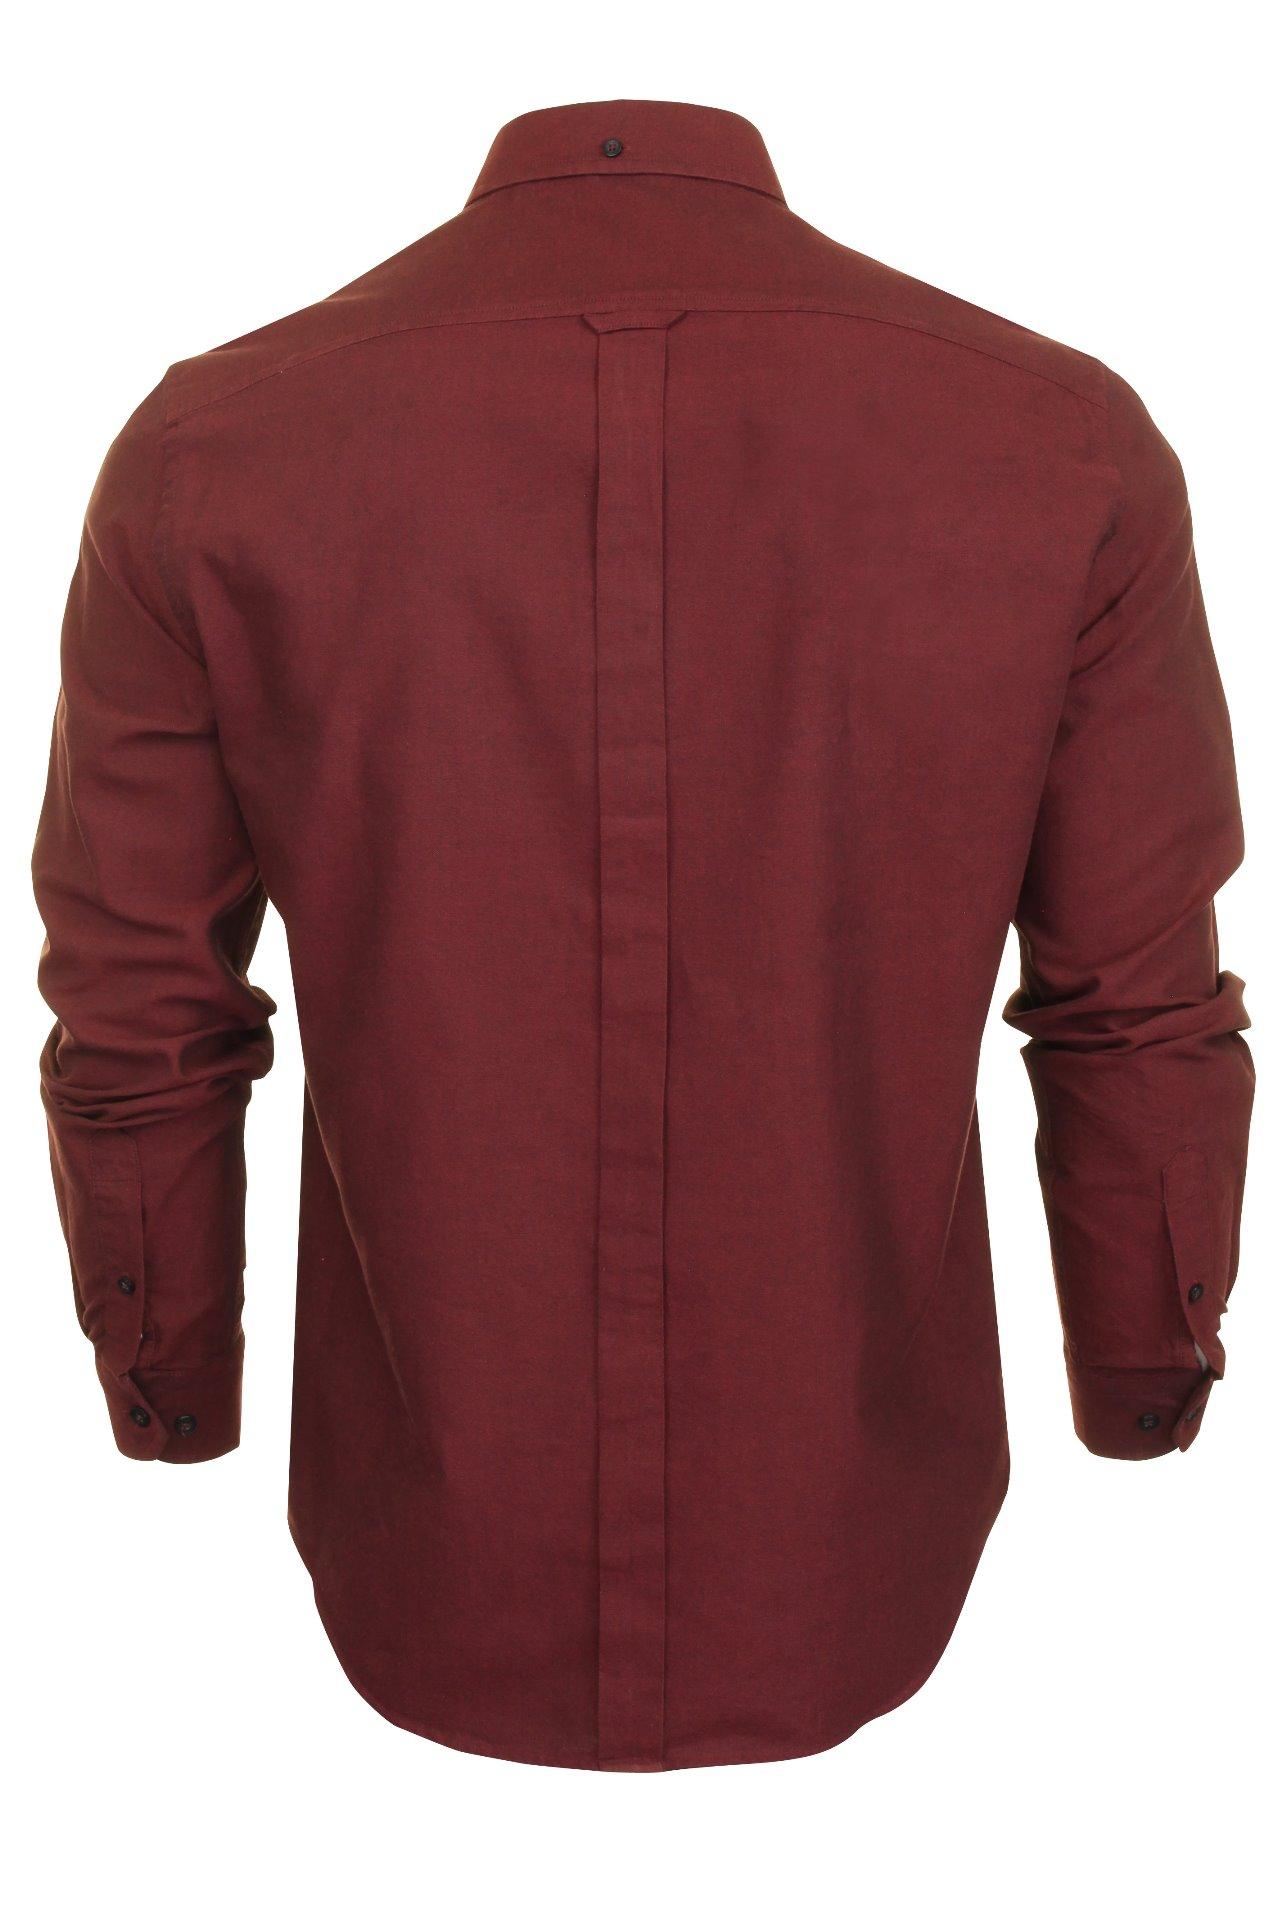 Ben-Sherman-Long-Sleeved-039-Oxford-039-Shirt thumbnail 5